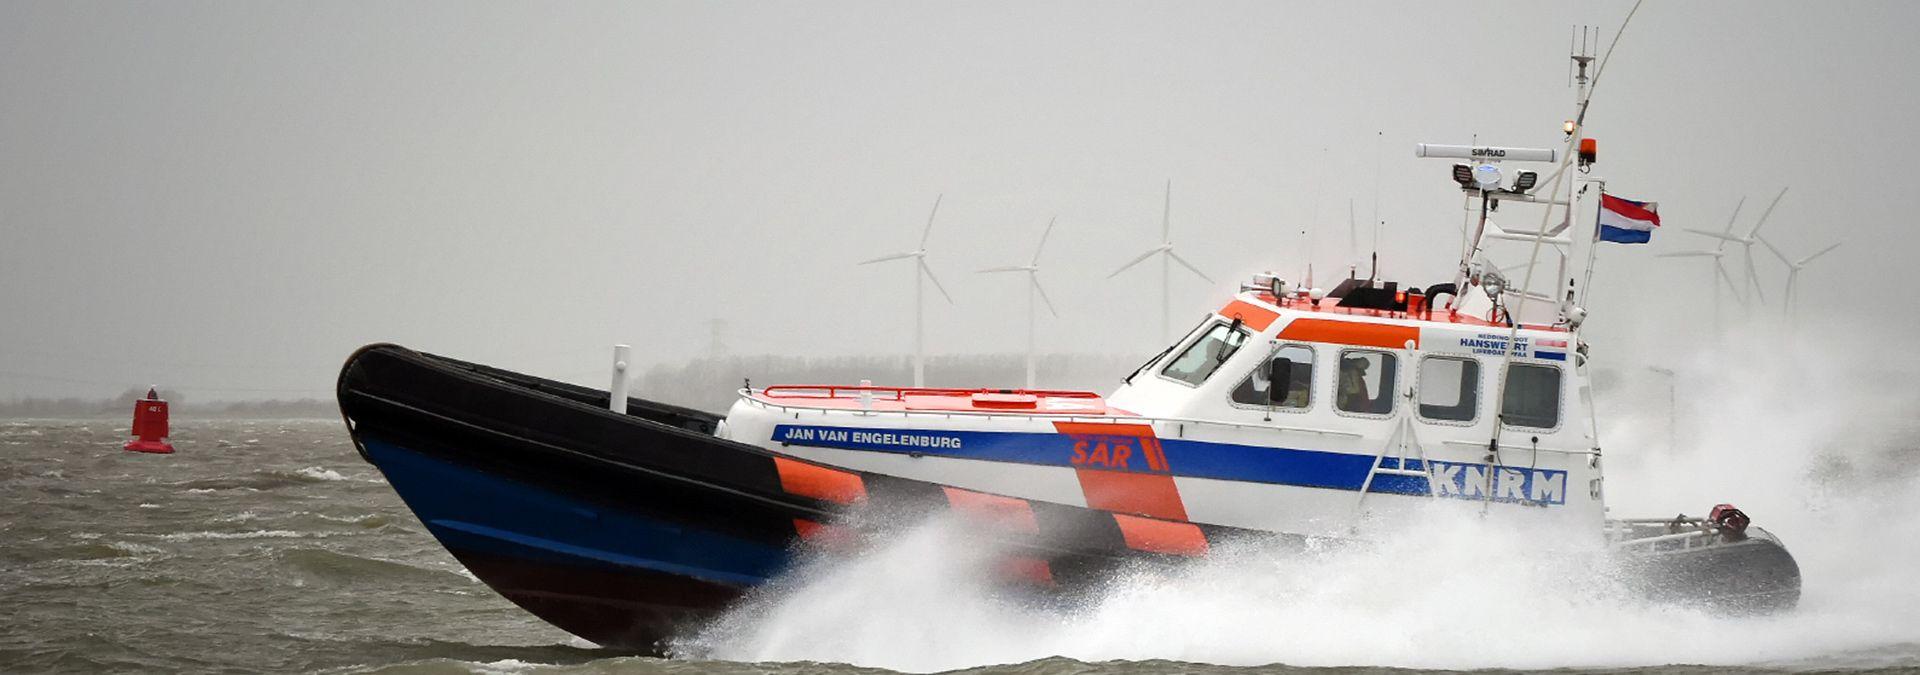 Reddingboot Jan van Engelenburg